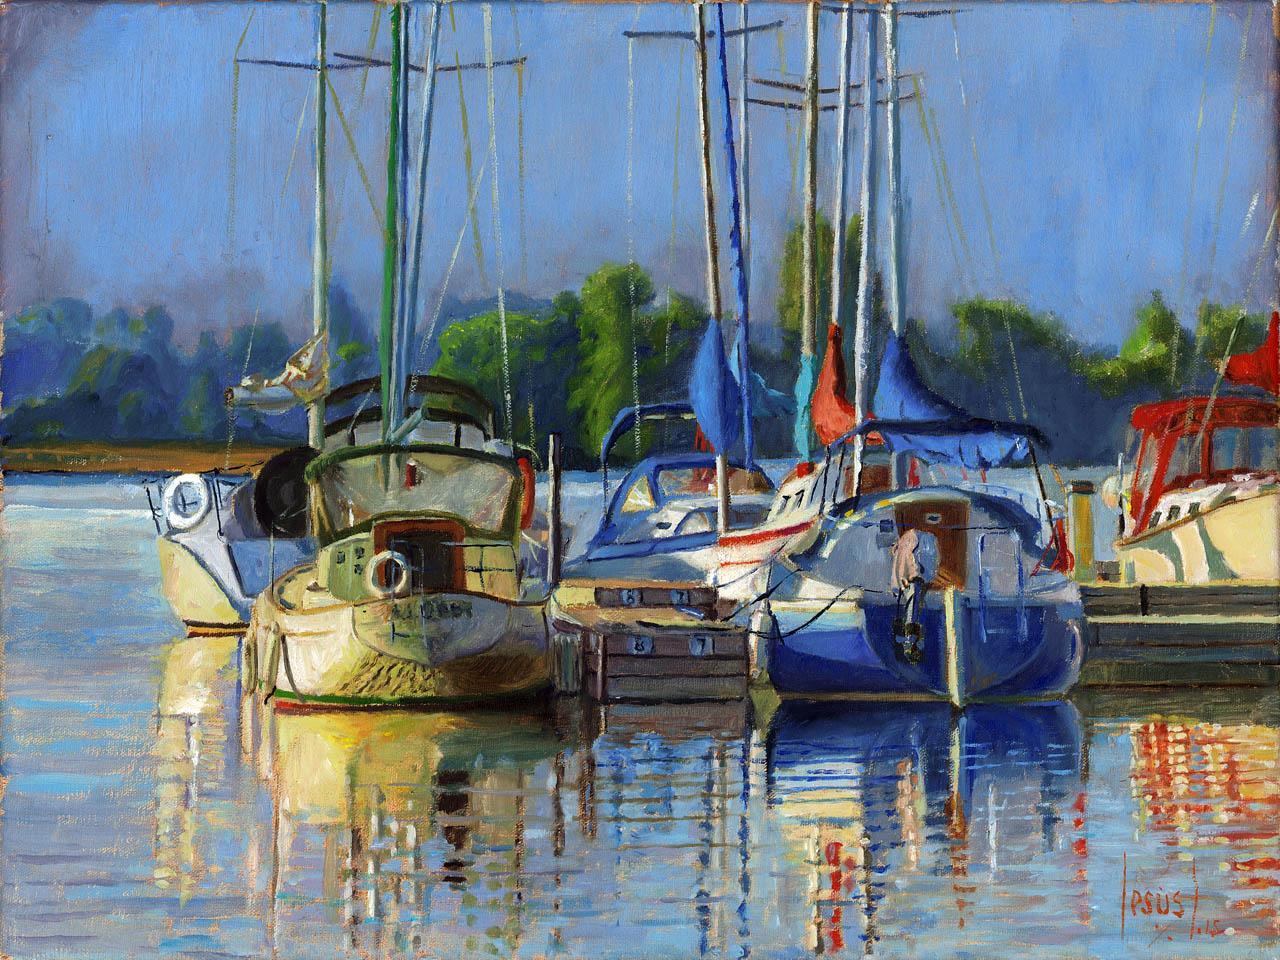 Jesus Estevez - White And Blue Boats ,Victoria Harbor, Belleville